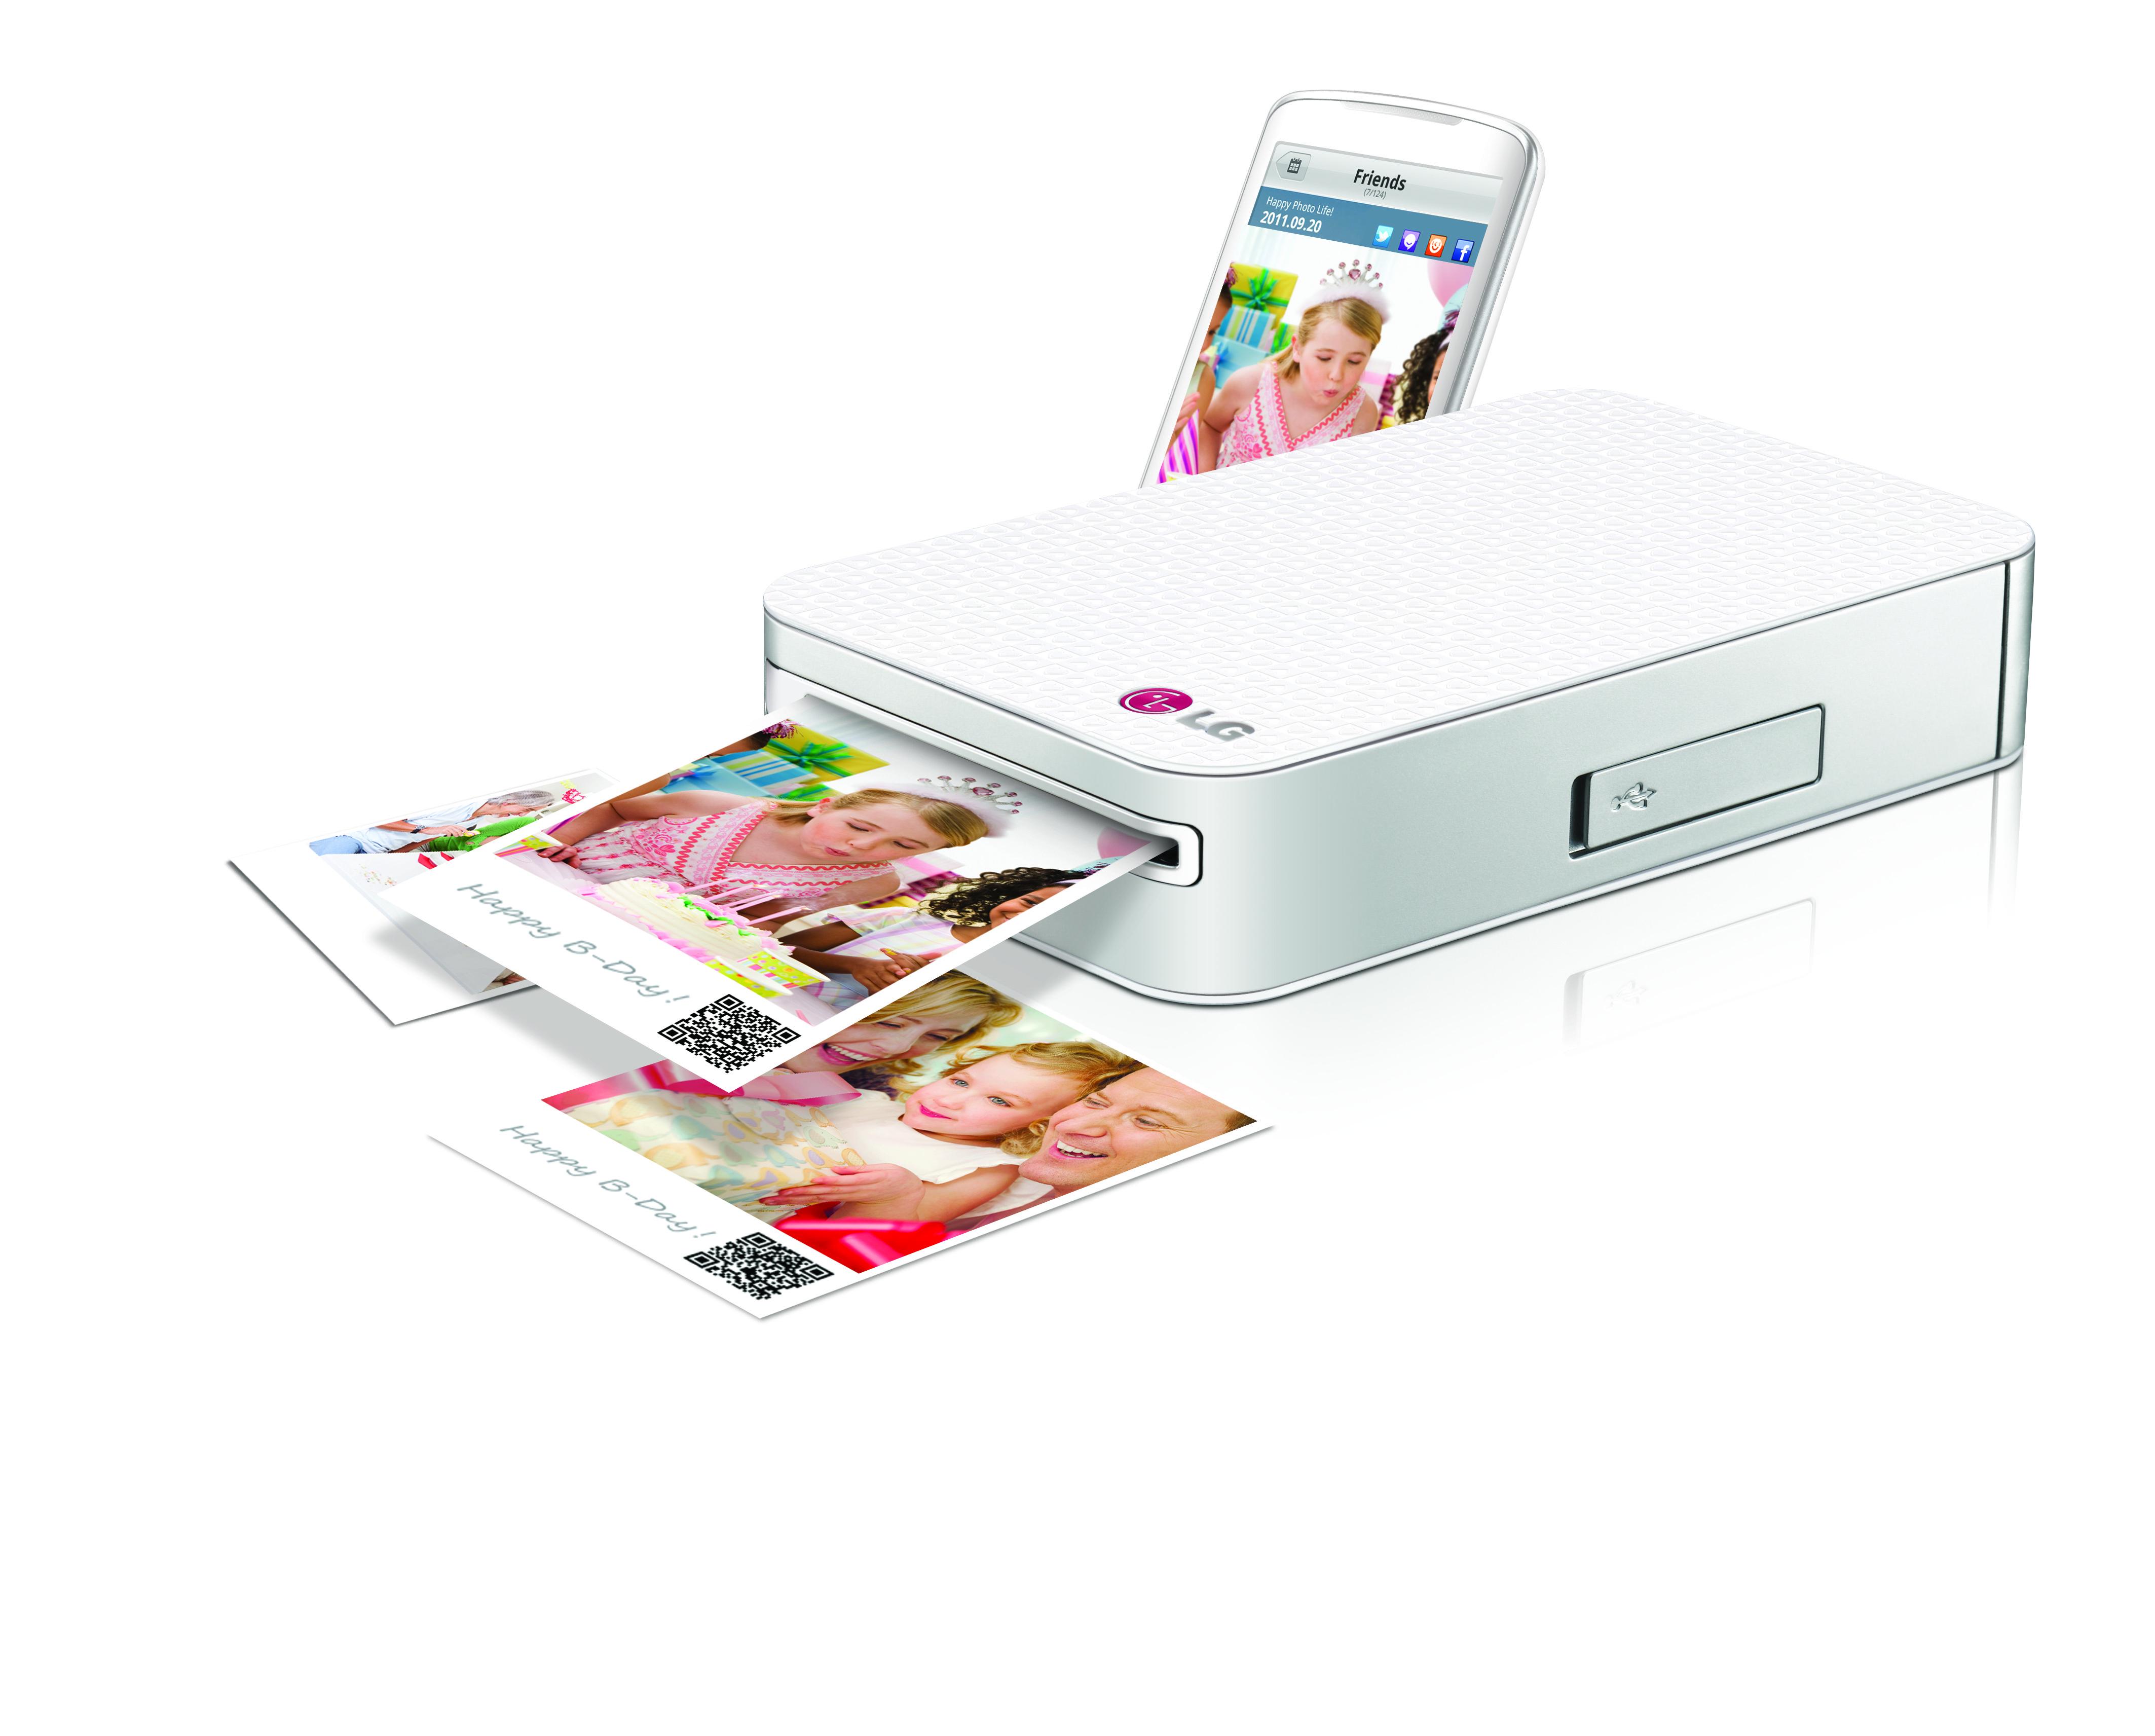 машина для печати фото с телефона ваших